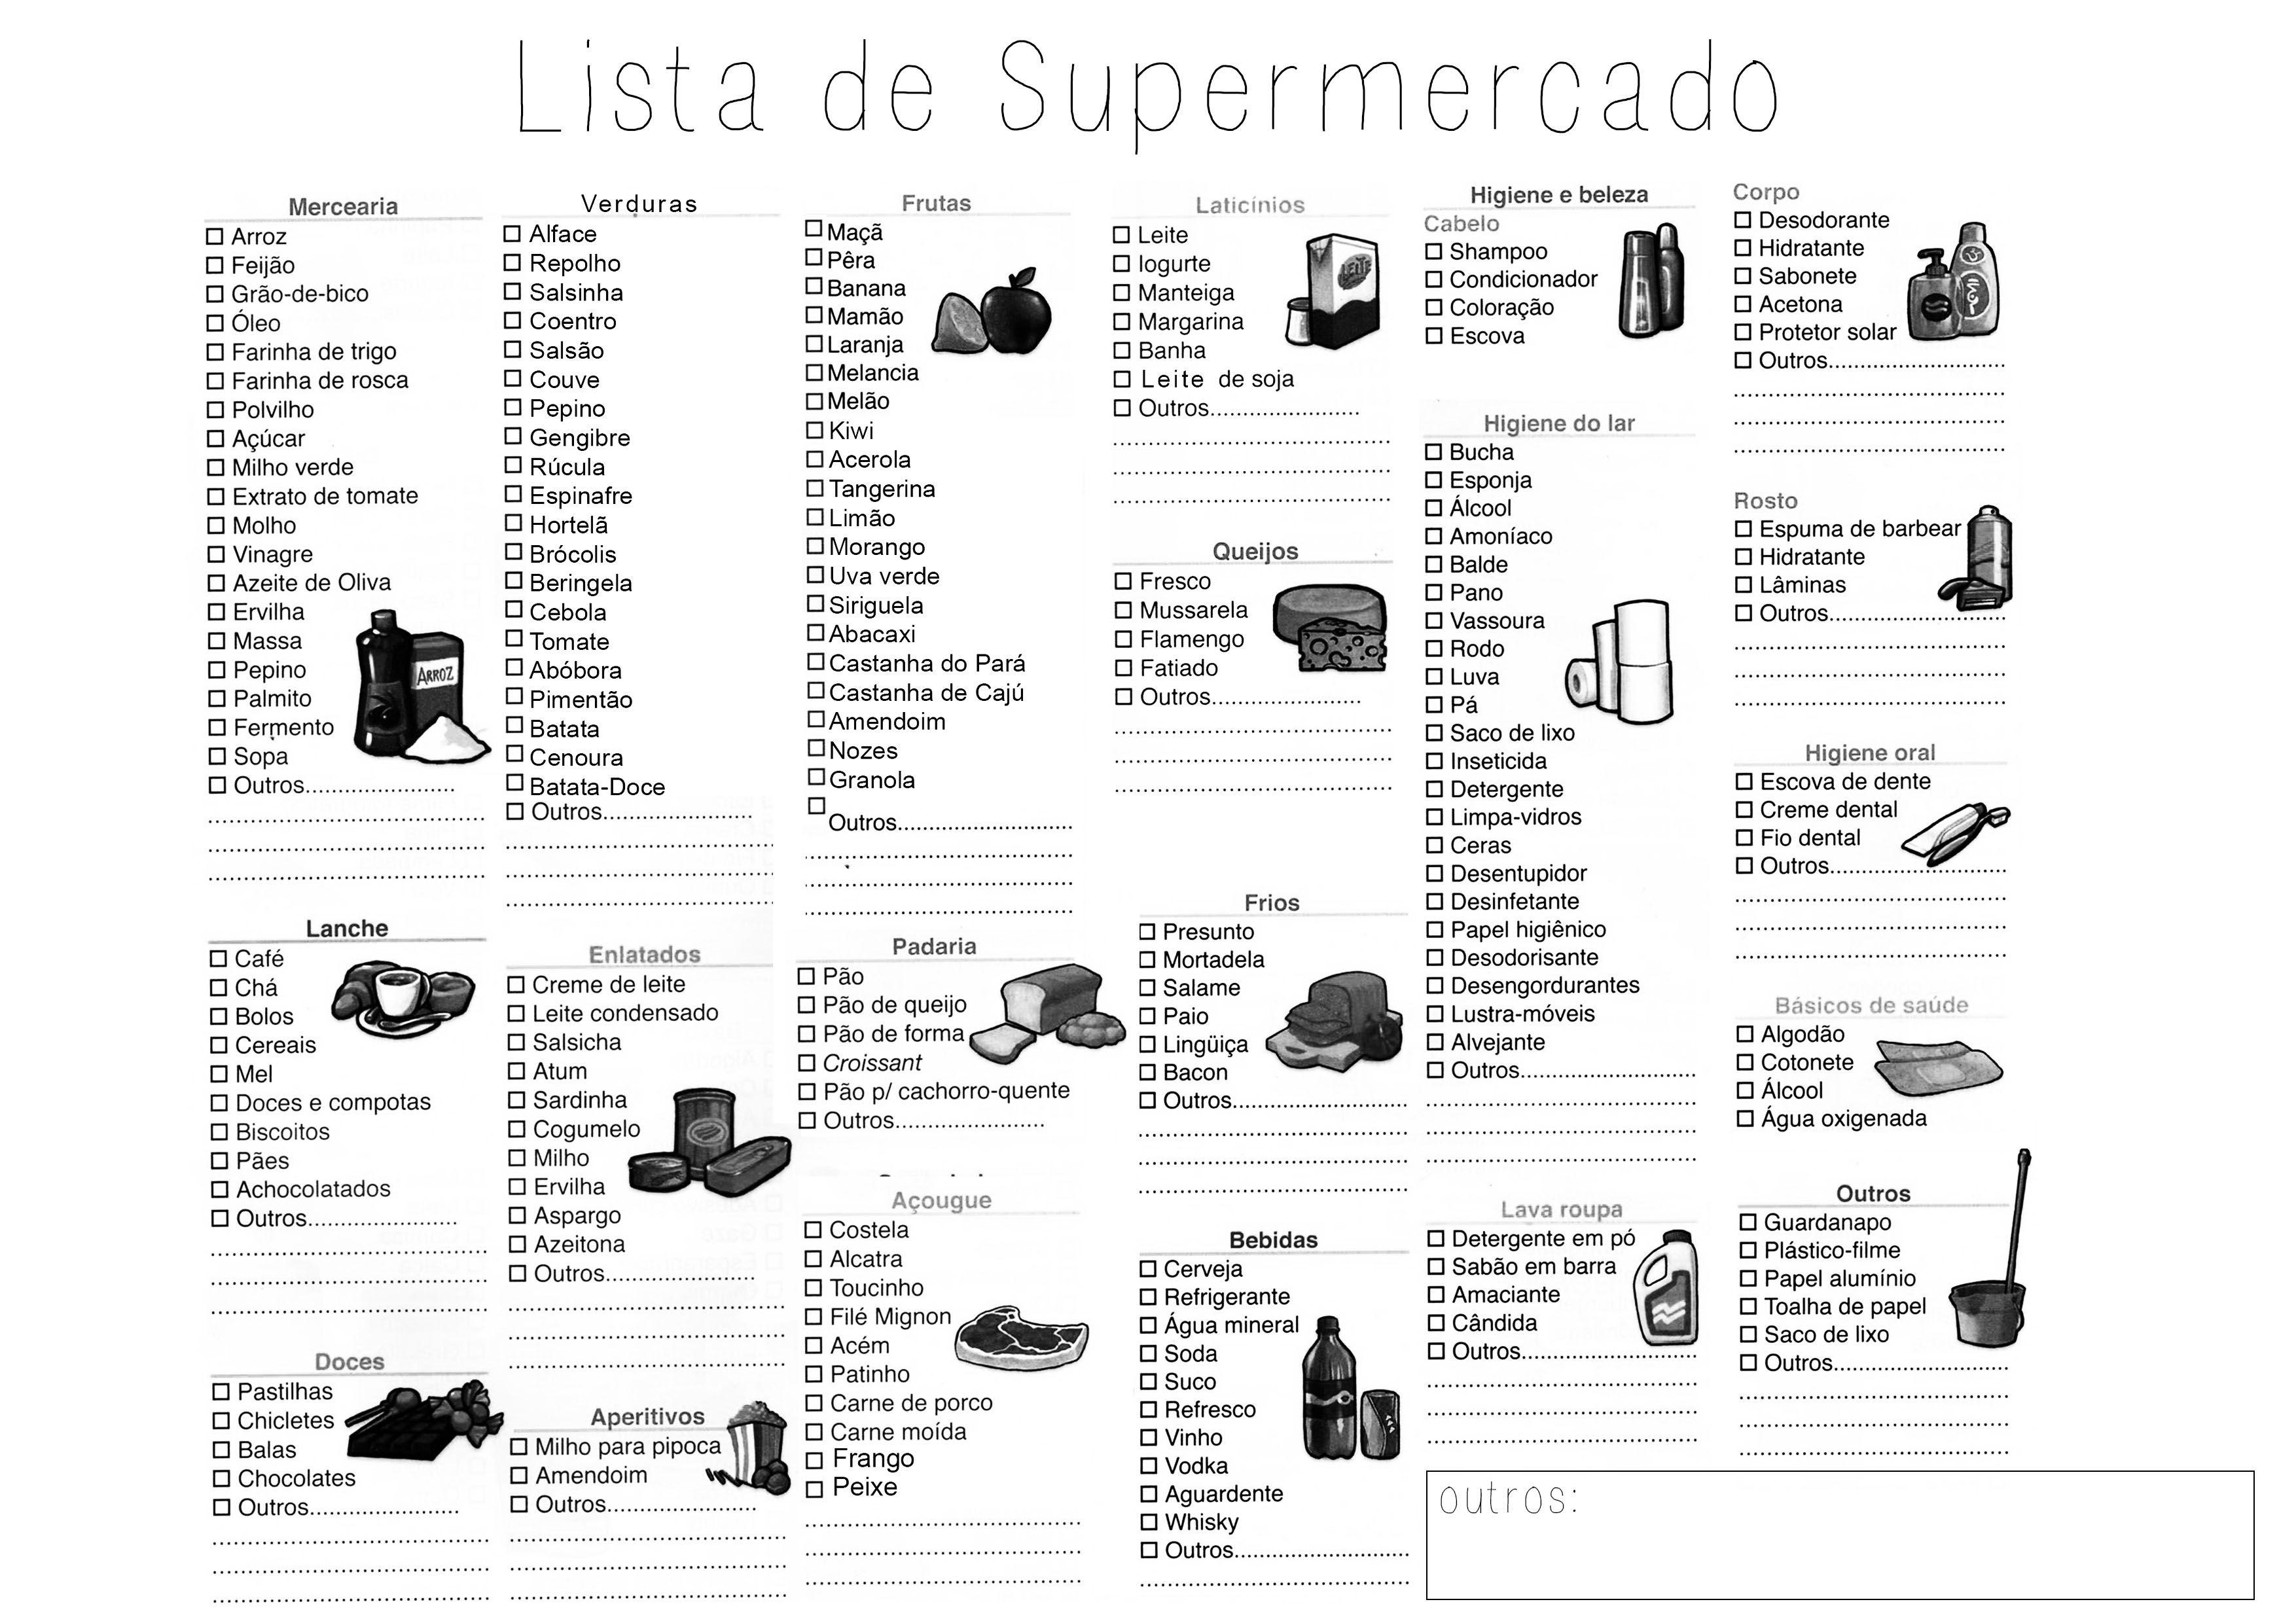 Lista Checklist De Supermercado Pra Deixar A Vida Mais Facil